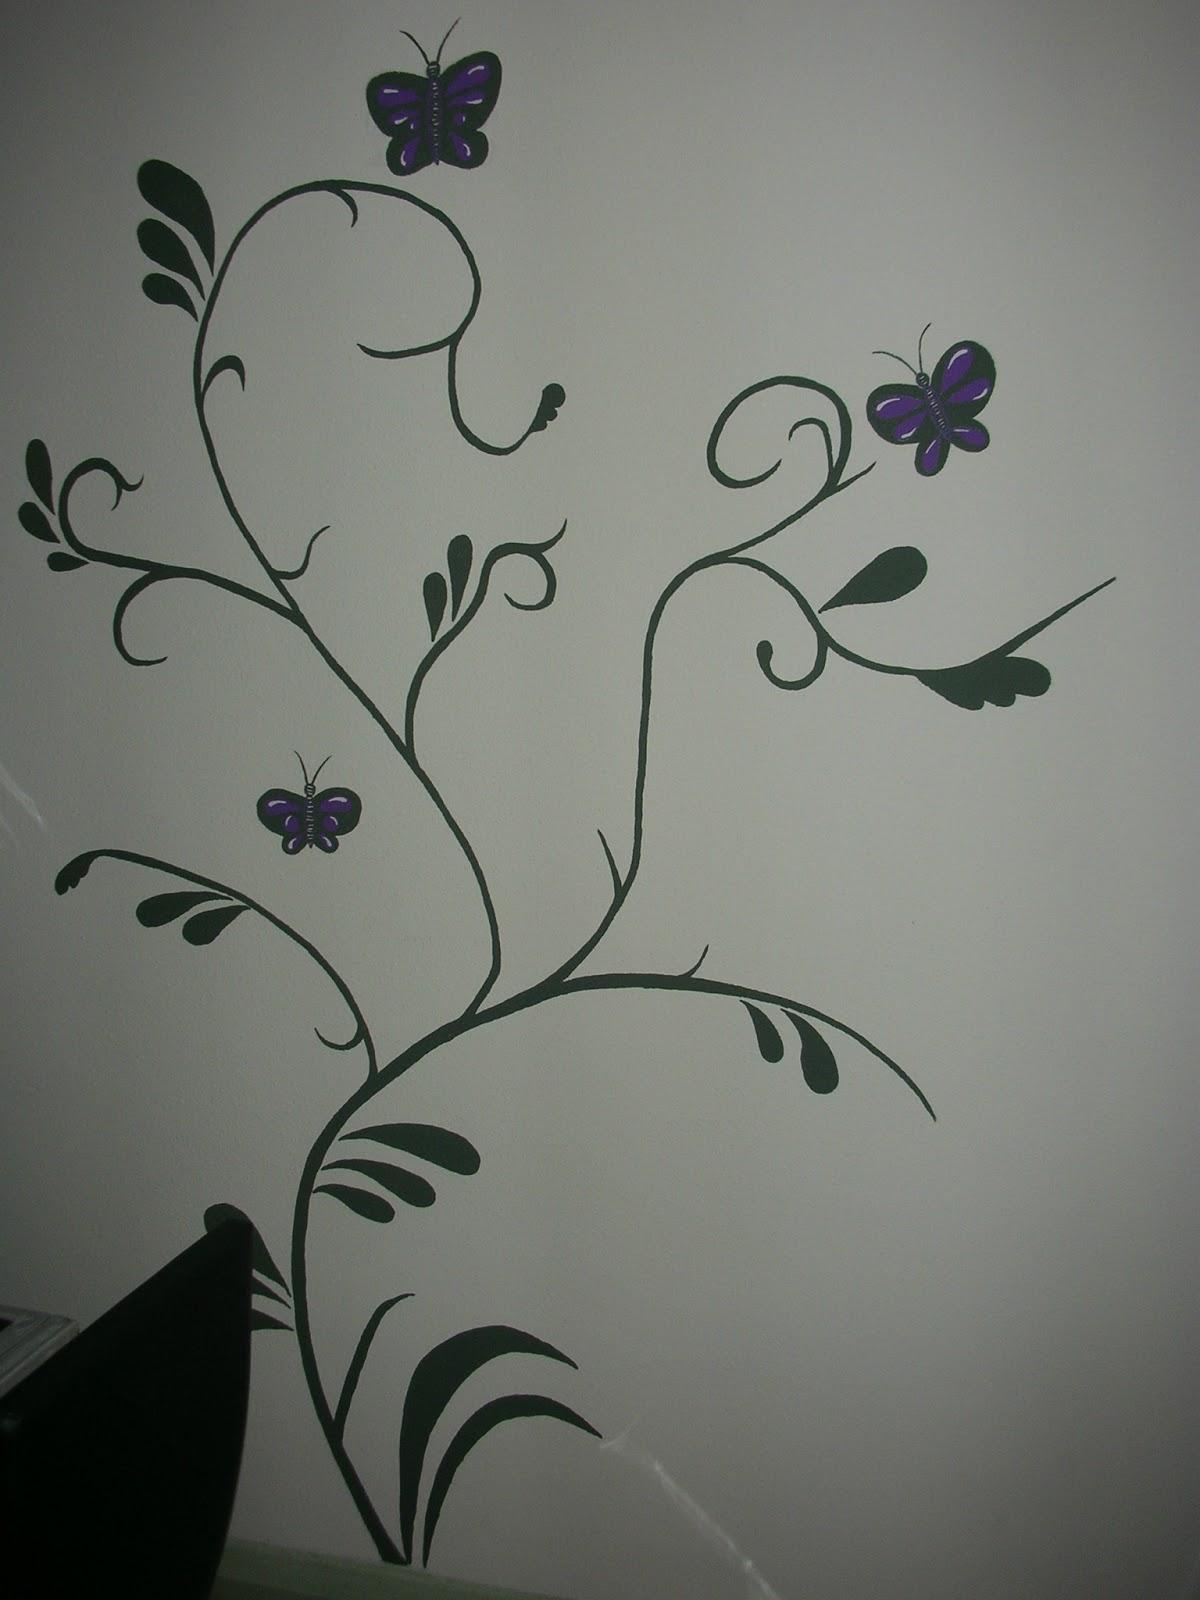 Imagenes de flores para decorar paredes imagenes de flores - Dibujos para pintar paredes ...